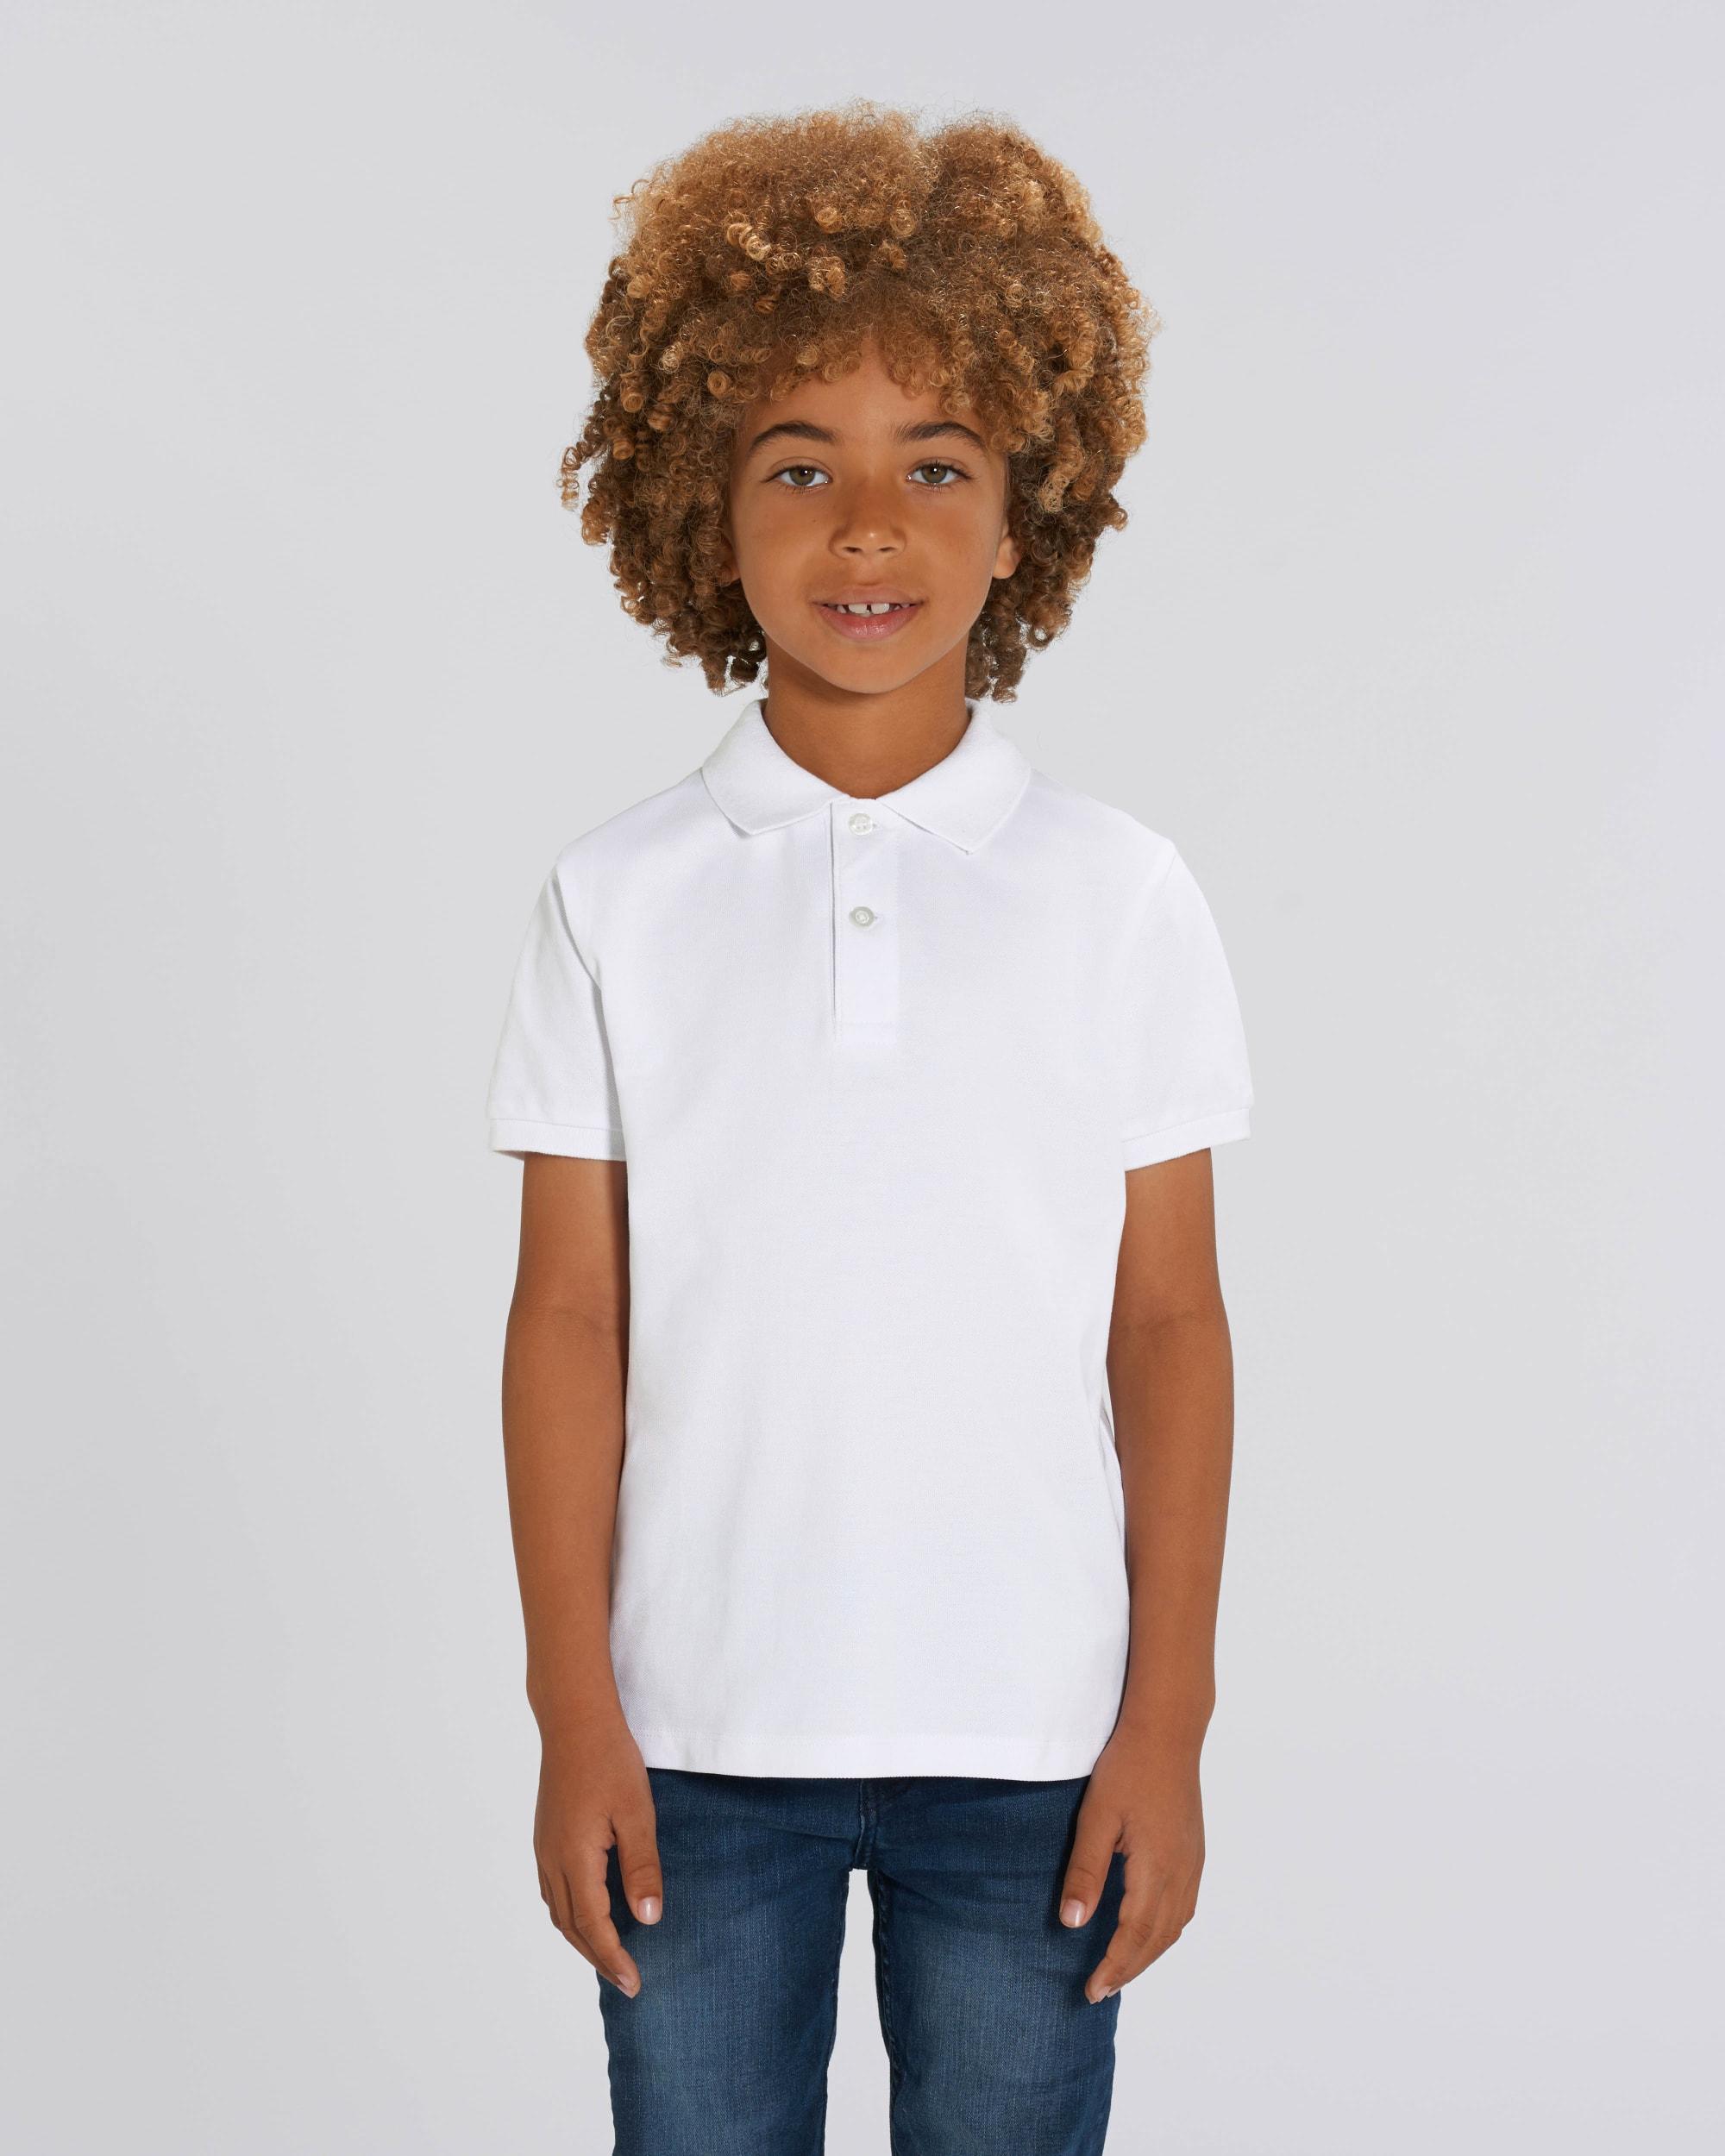 MINI SPRINTER STPK908 Iconic Kinder Poloshirt Stanley/Stella